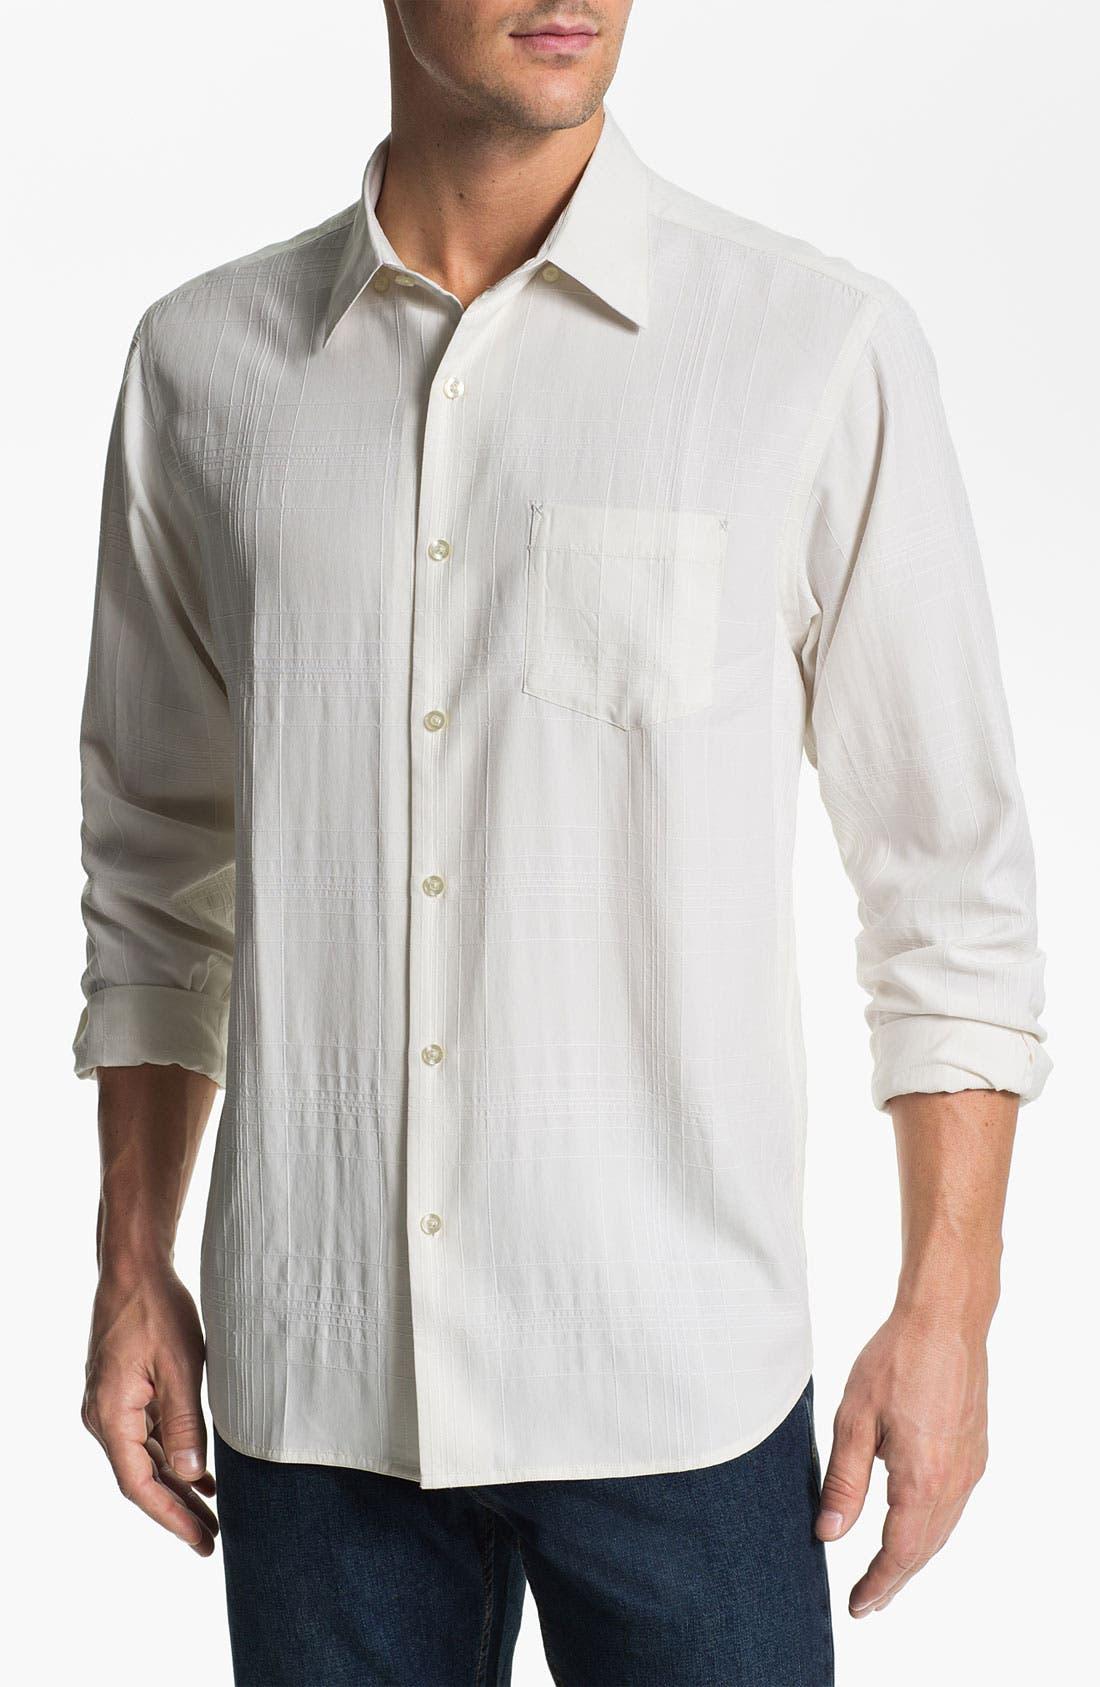 Main Image - Tommy Bahama 'Skyscraper' Silk Sport Shirt (Big & Tall)